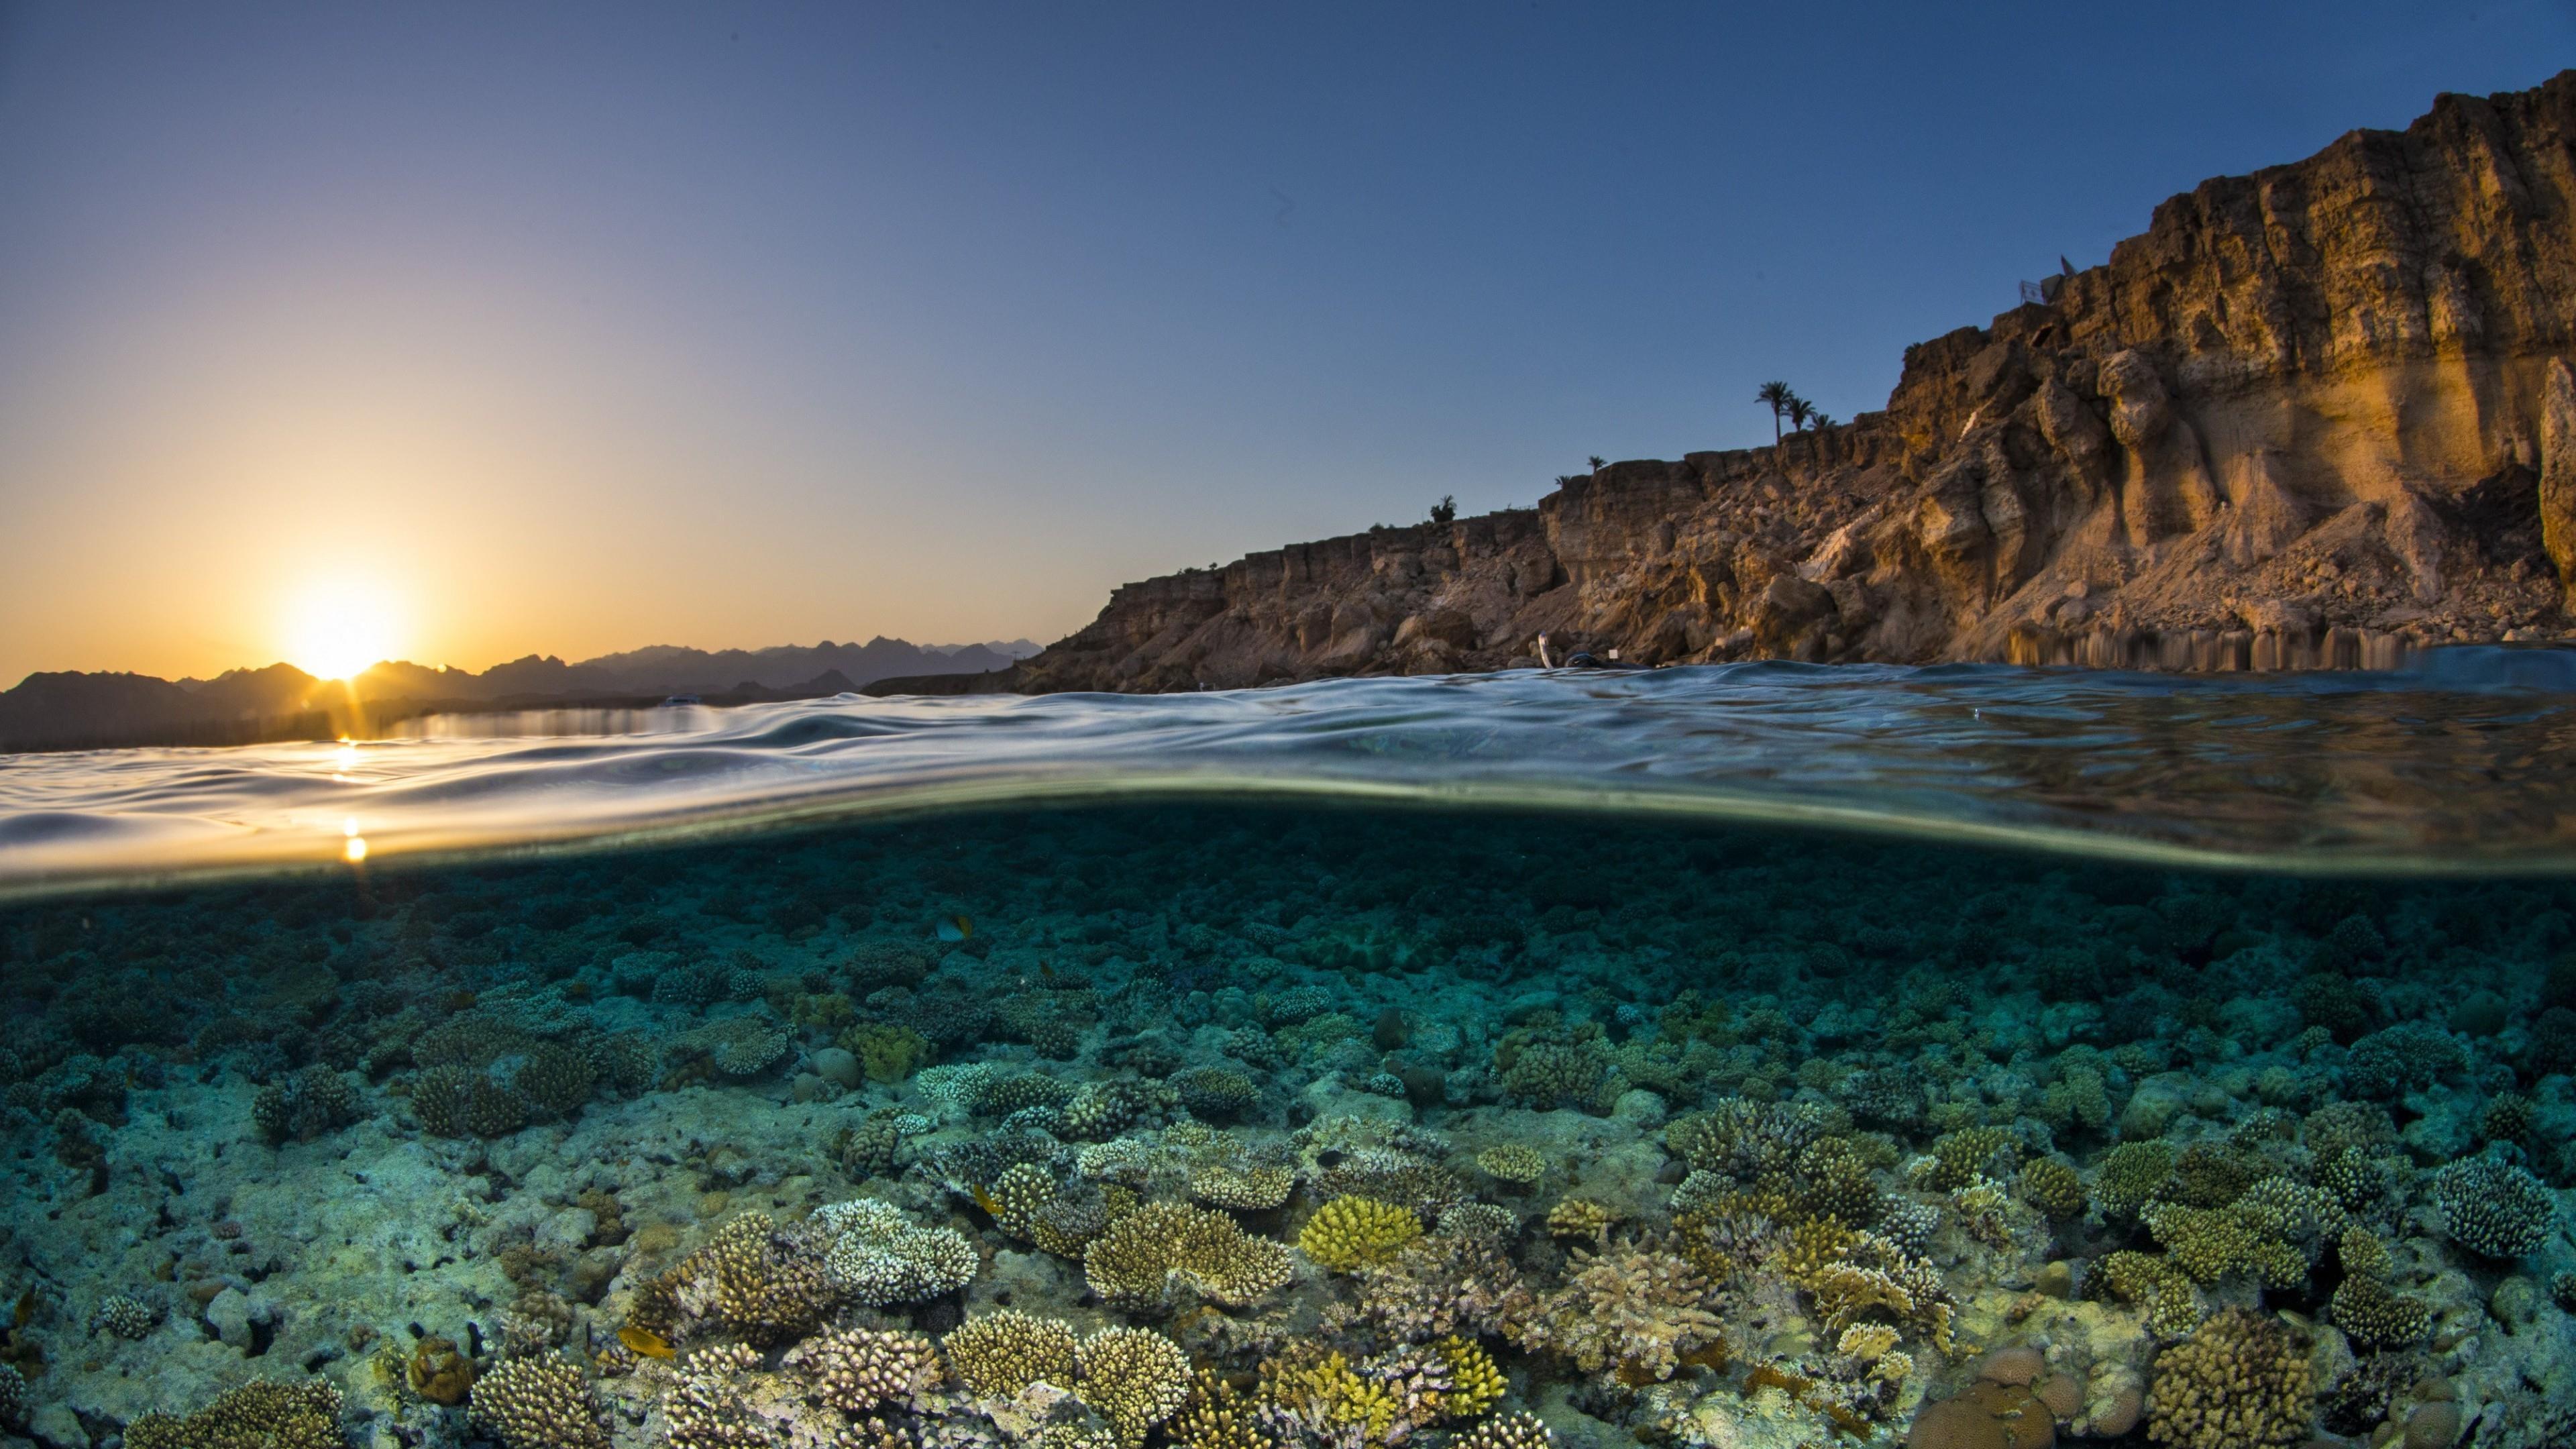 Sunset landscape with underwater corals wallpaper